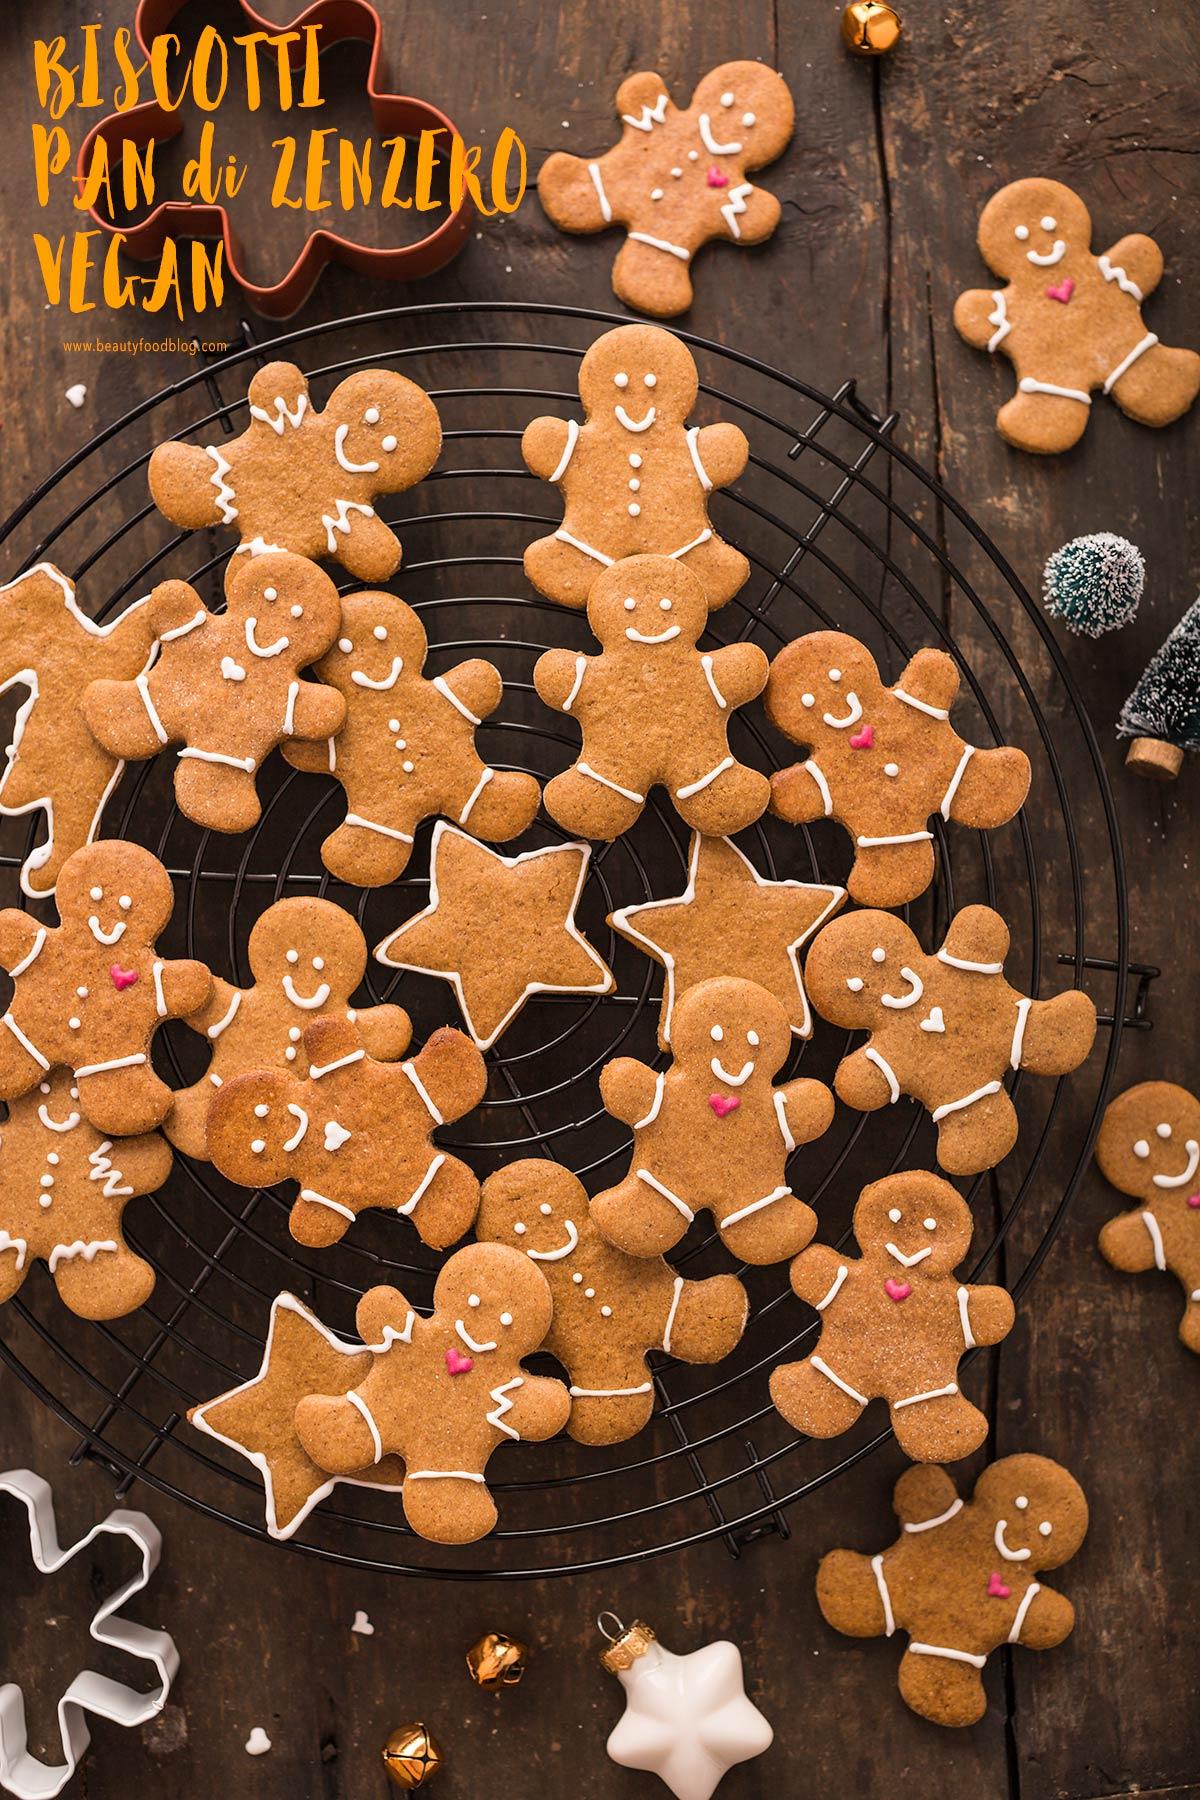 delicious vegan gingerbread man vegani - biscotti pan di zenzero vegani croccanti leggeri friabili #vegan gingerbread senza burro